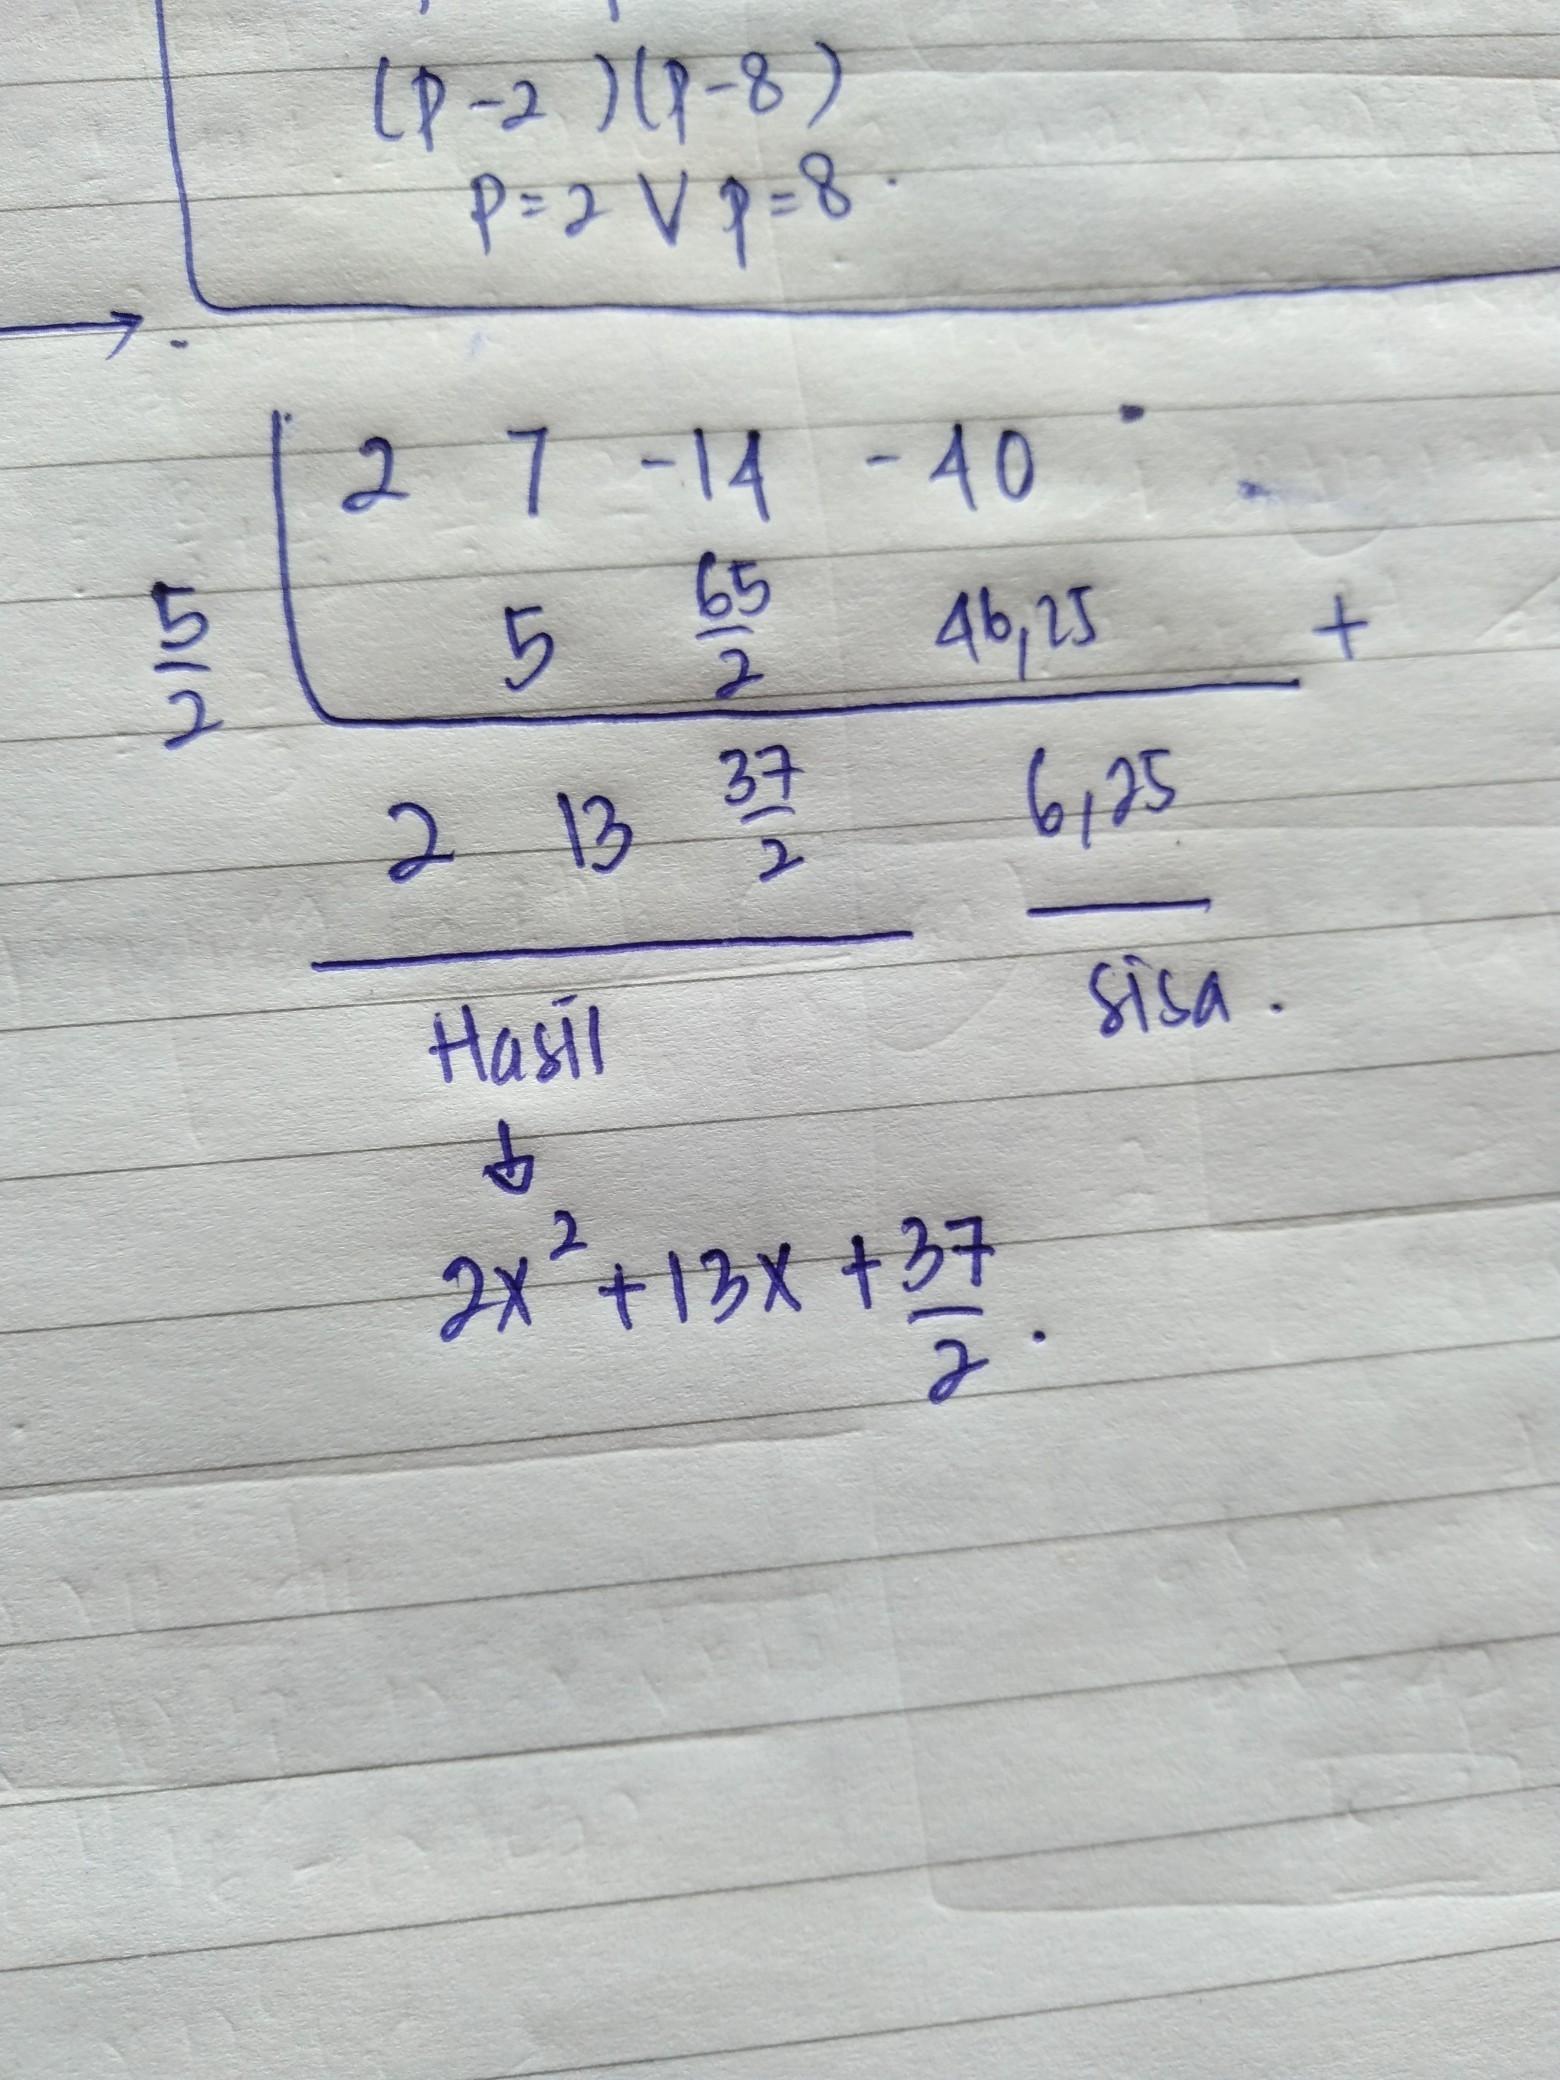 2x 7x 14x 40 2x 5 Tolong Di Jwab Pakai Caranya Brainly Co Id